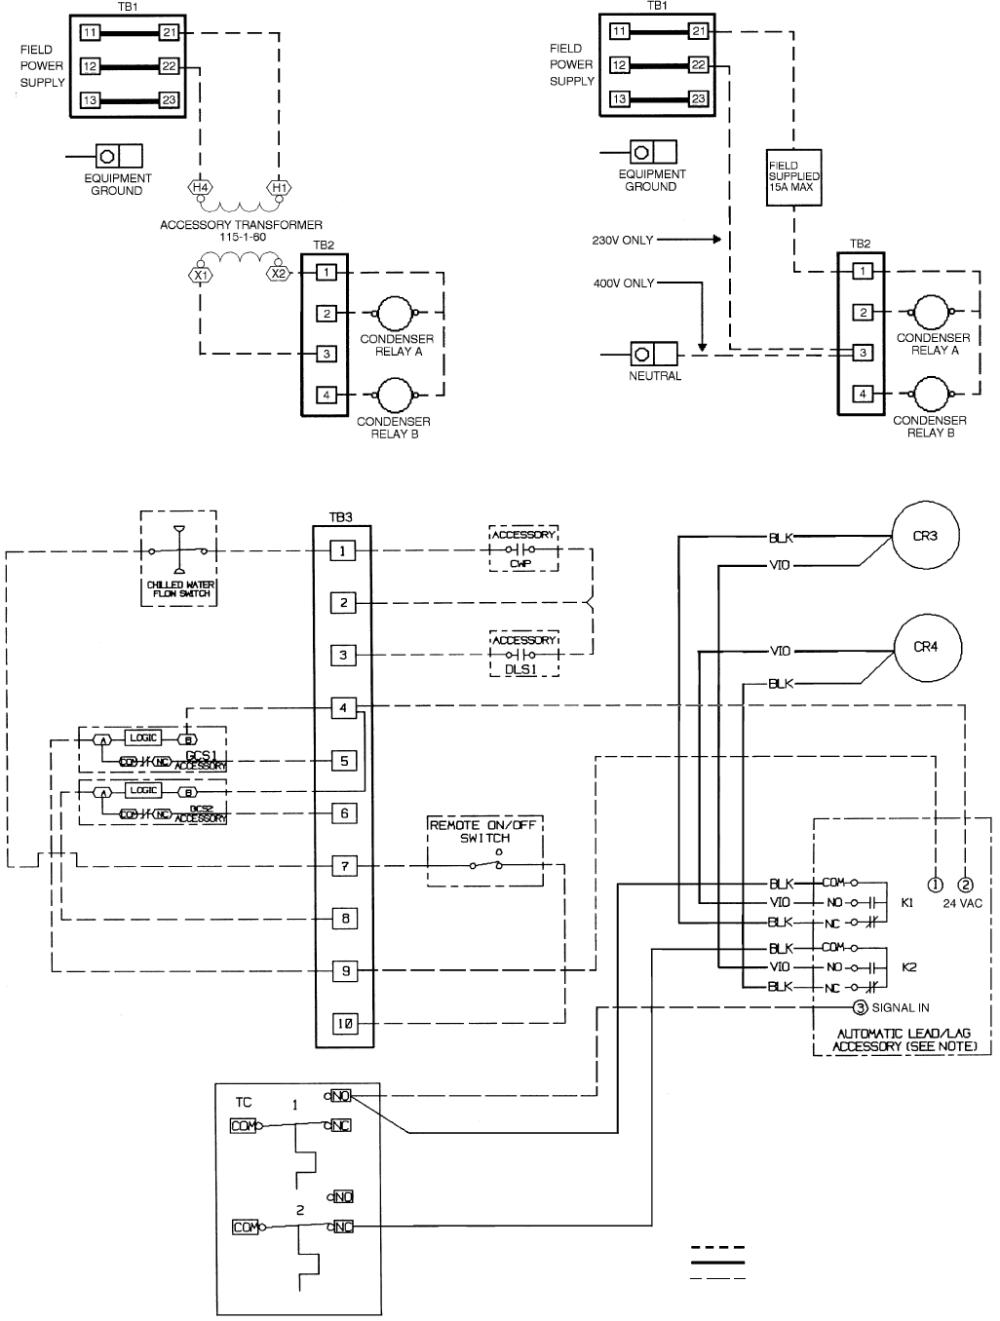 medium resolution of carrier 060 30hk040 060 30hl050 30hw018 040 fig 17 field wiring diagram 30hk hl units